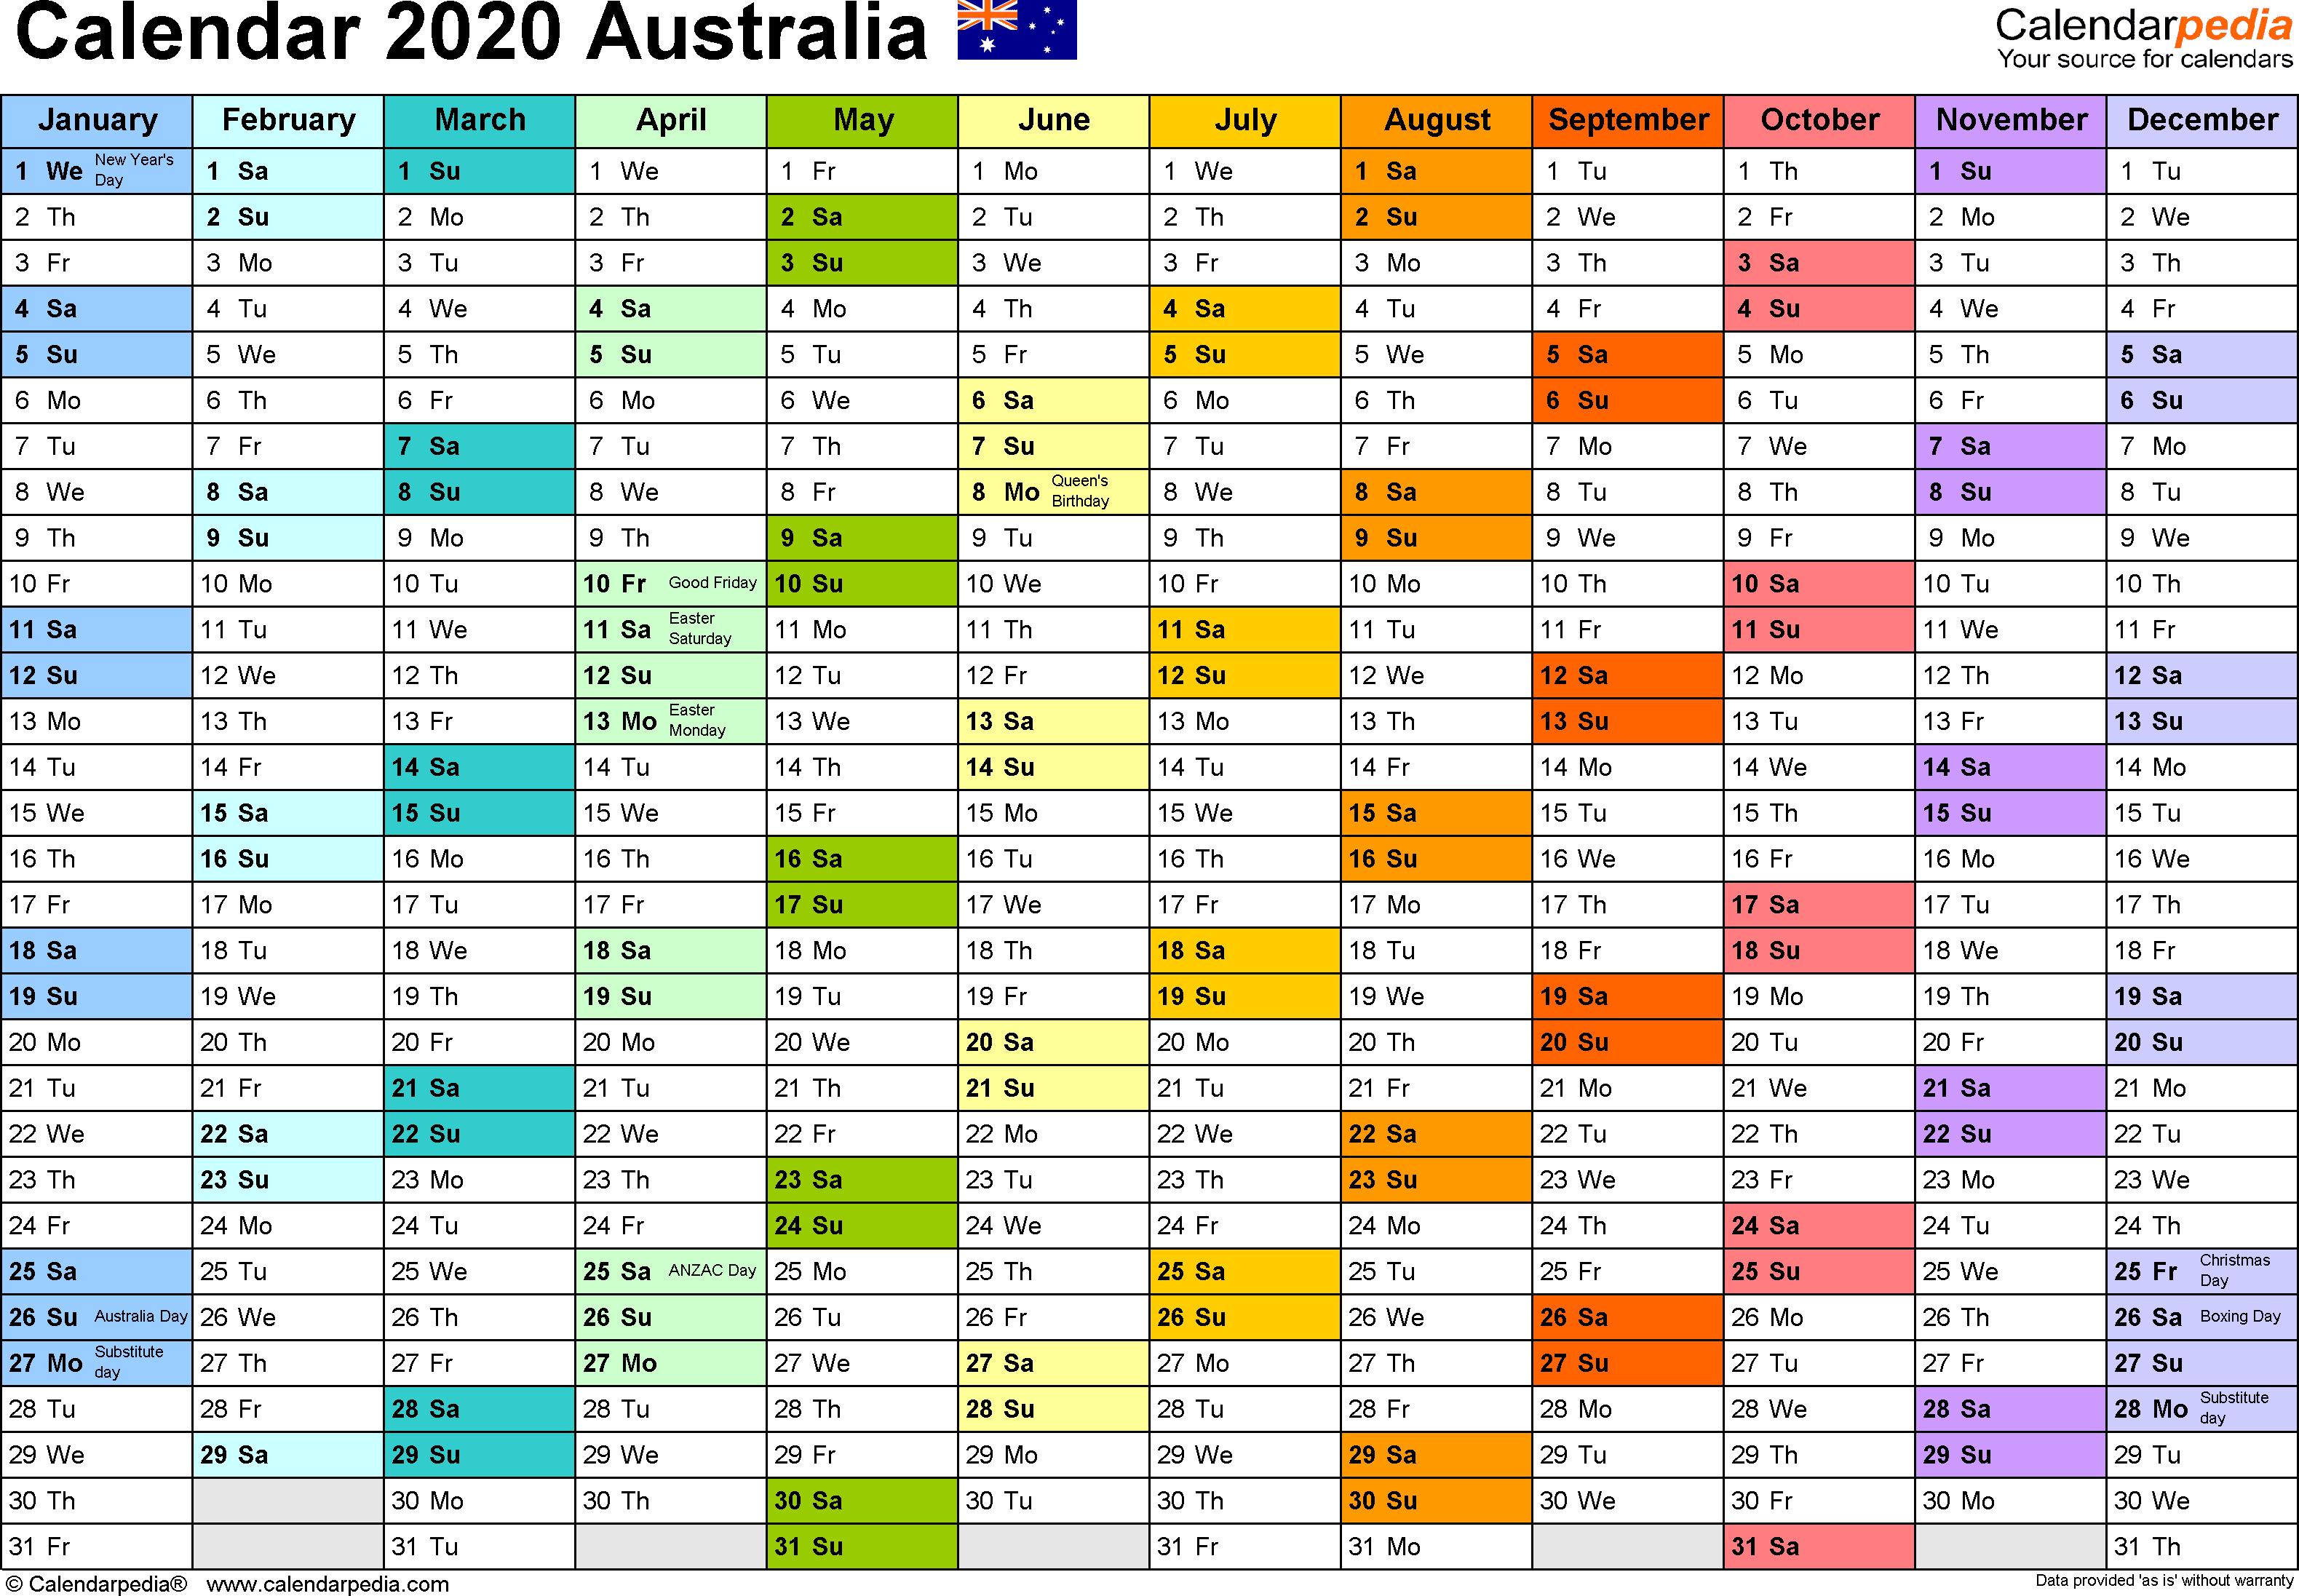 Australia Calendar 2020 - Free Printable Pdf Templates intended for Split Calendar 2019 2020 South Australia